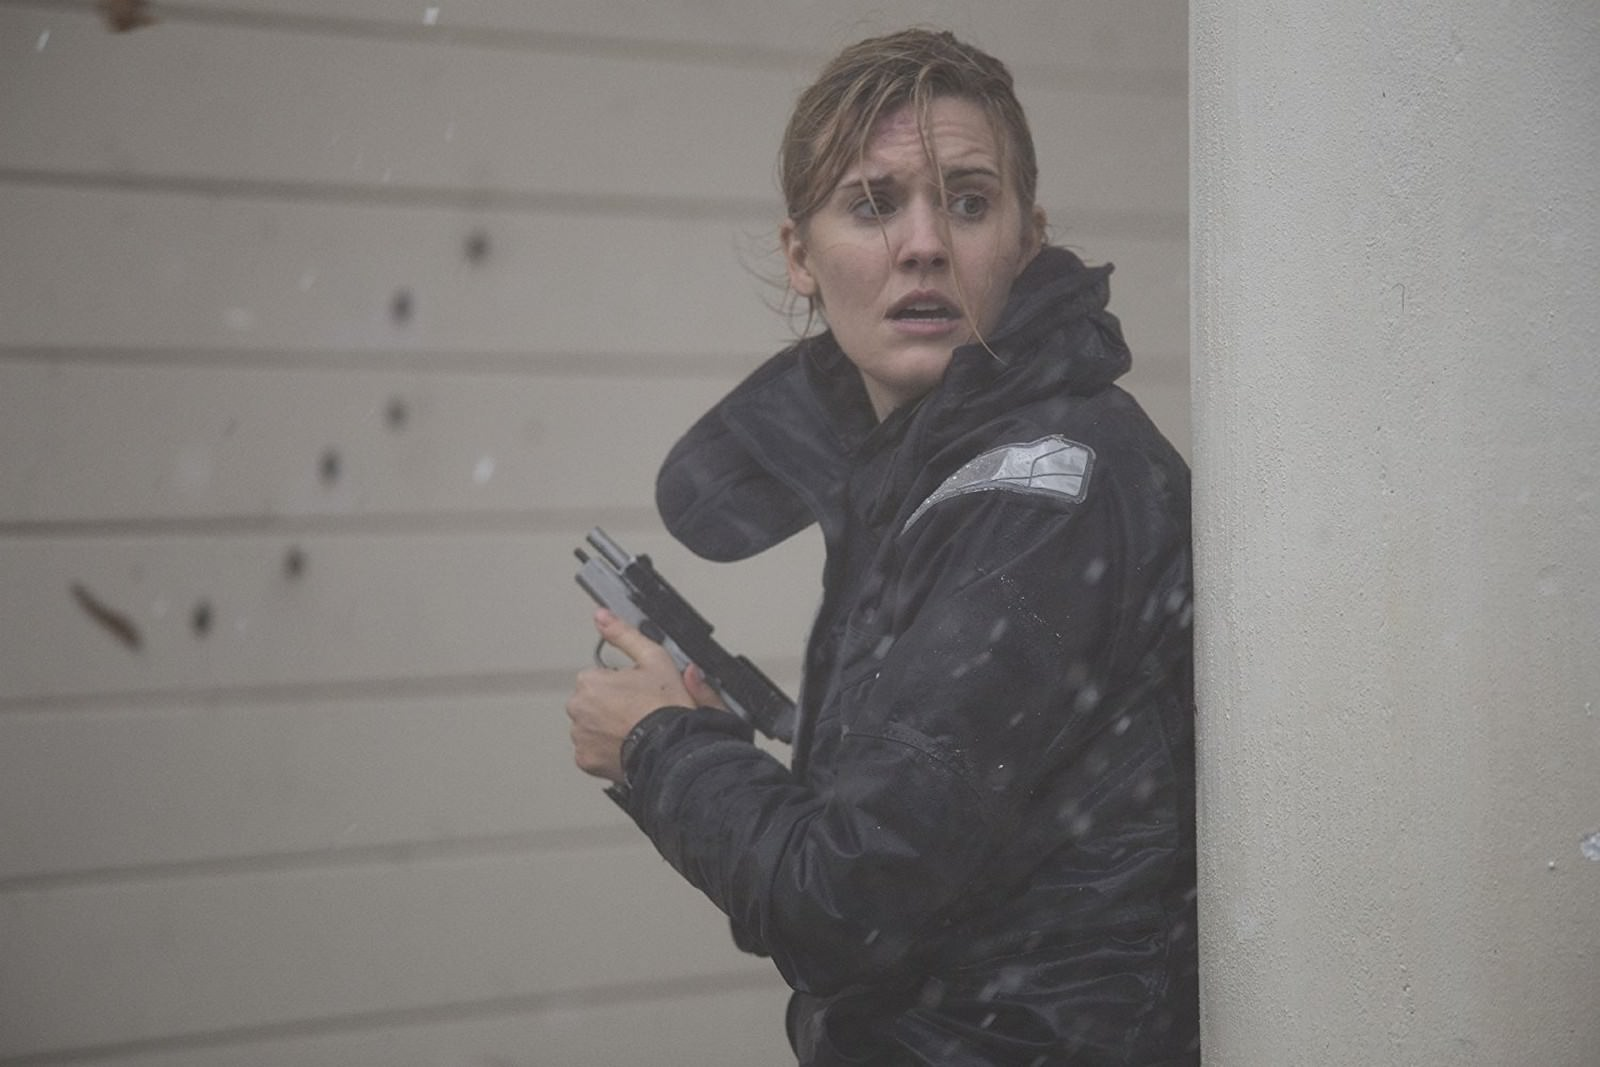 Movie, The Hurricane Heist(美國) / 玩命颶風(台) / 十級風劫(港) / 飓风抢劫(網), 電影劇照